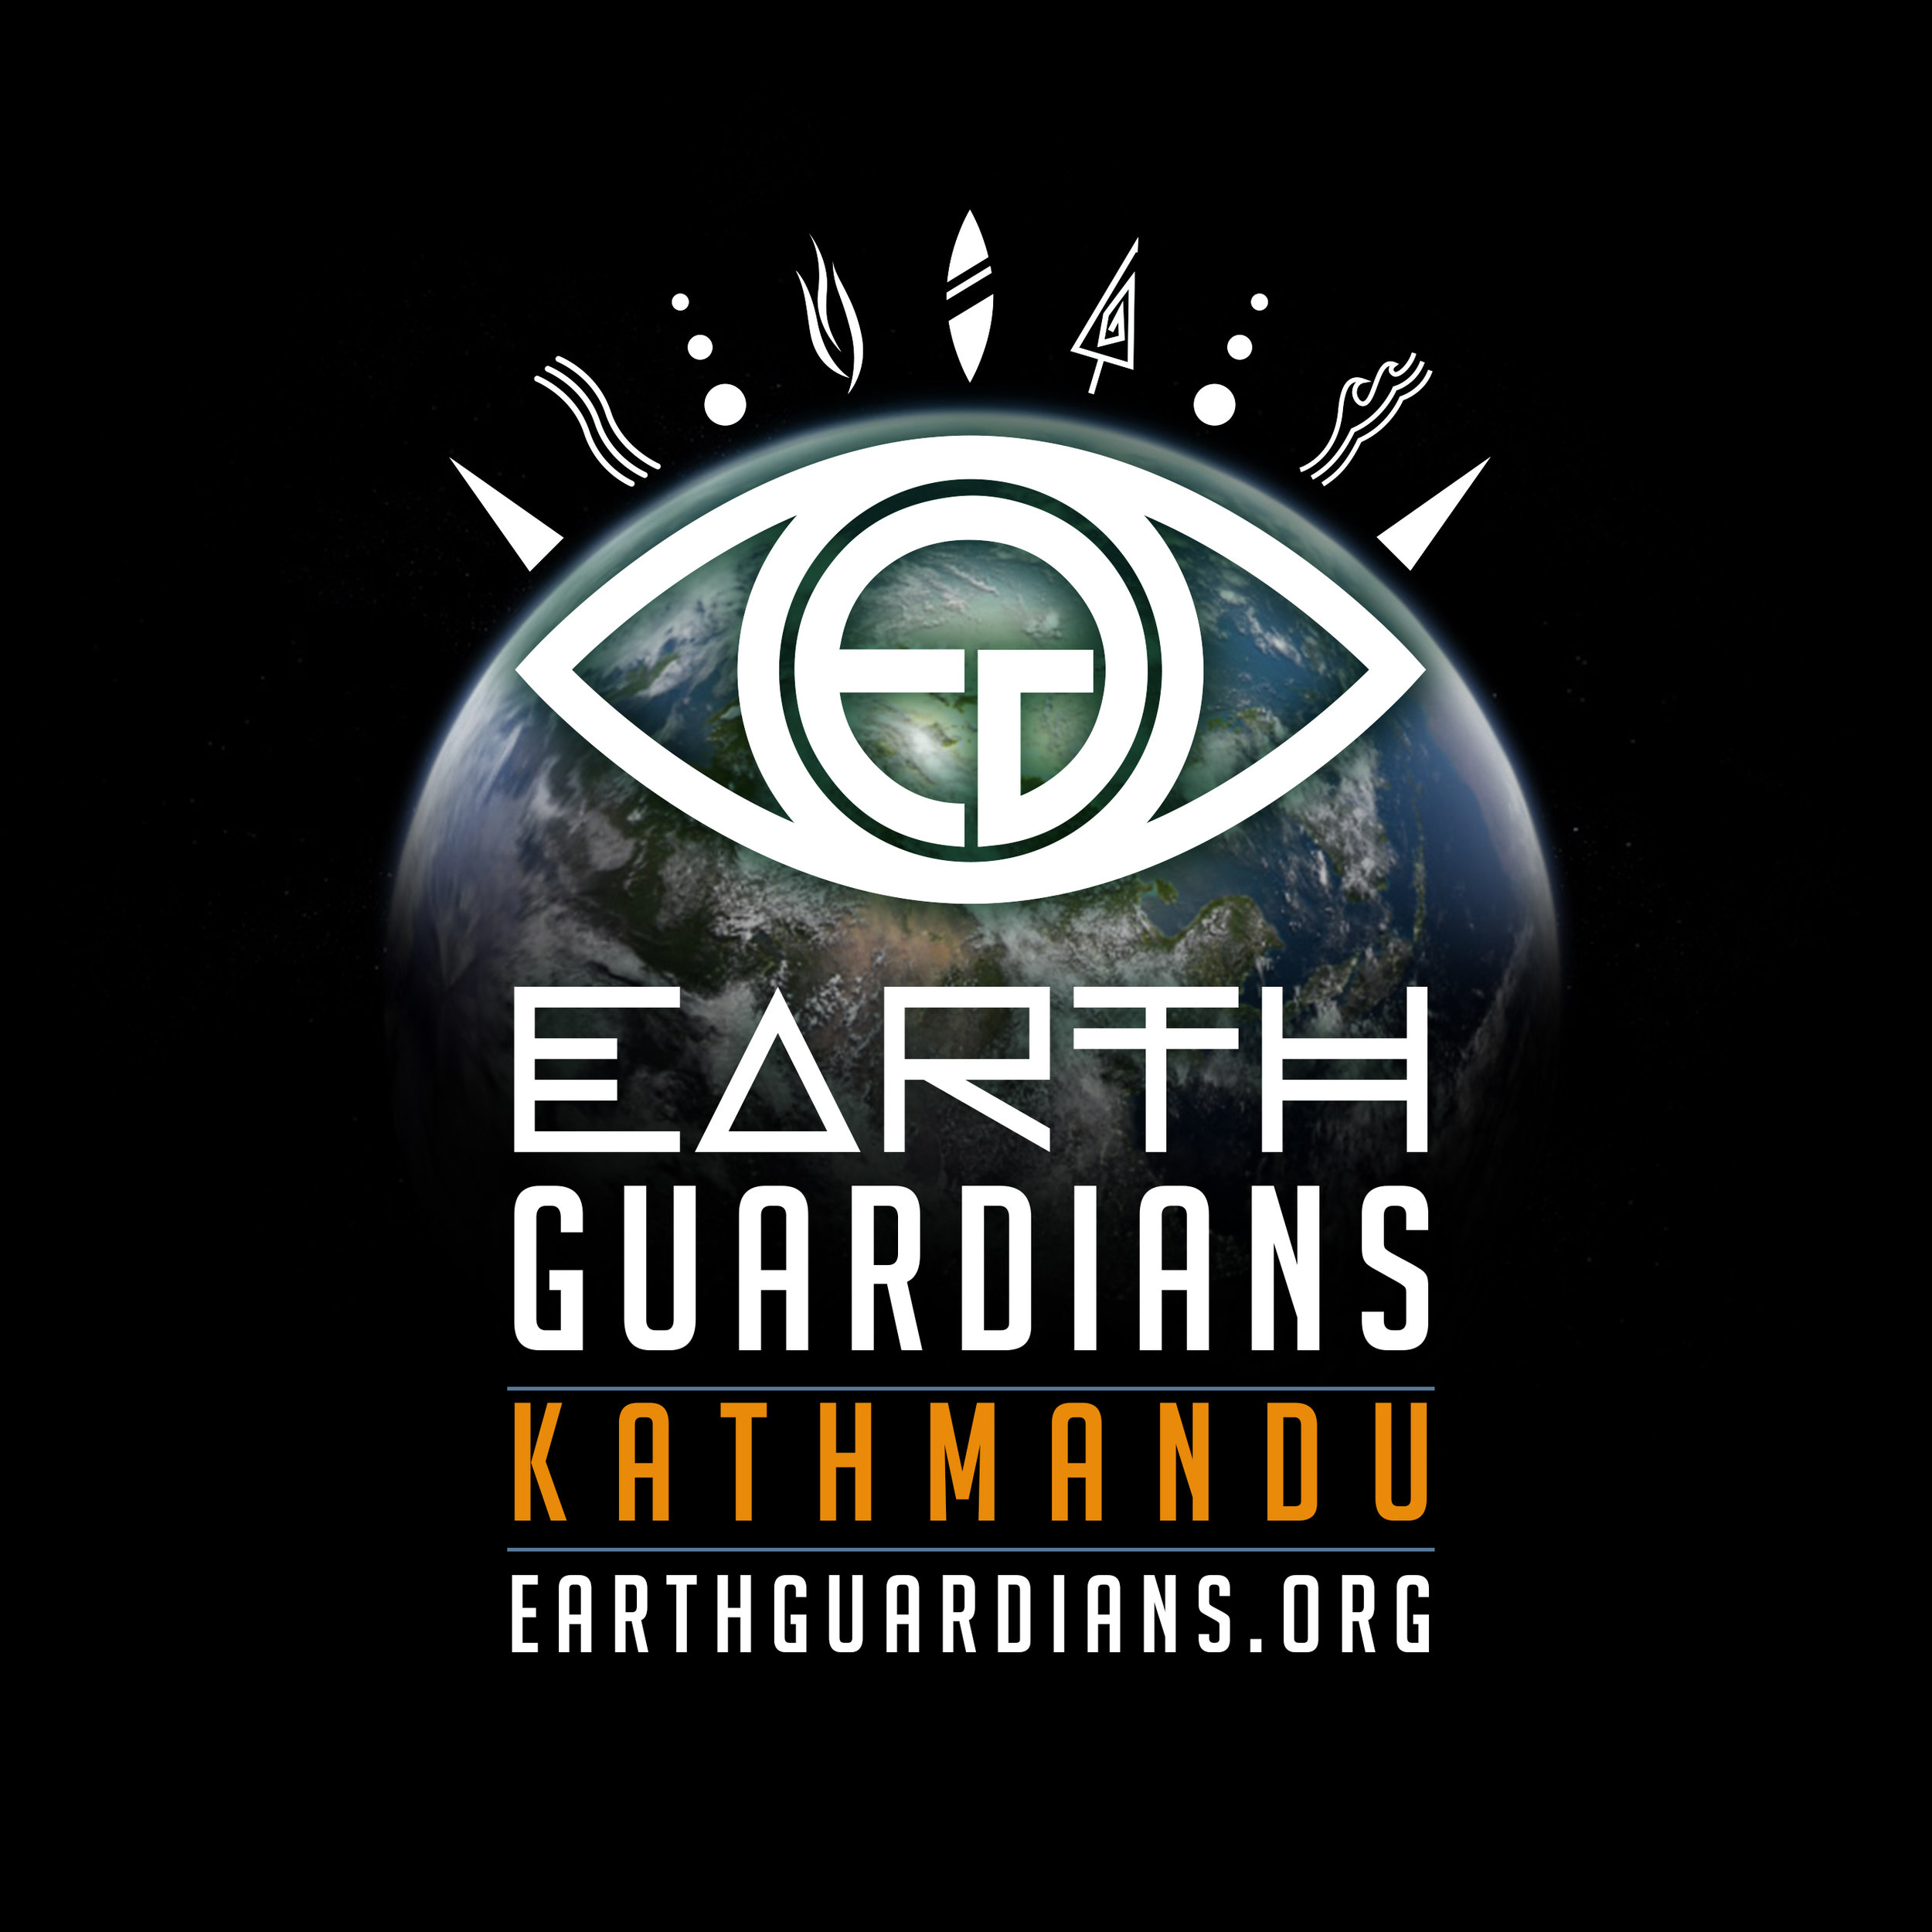 EG_Kathmandu.jpg